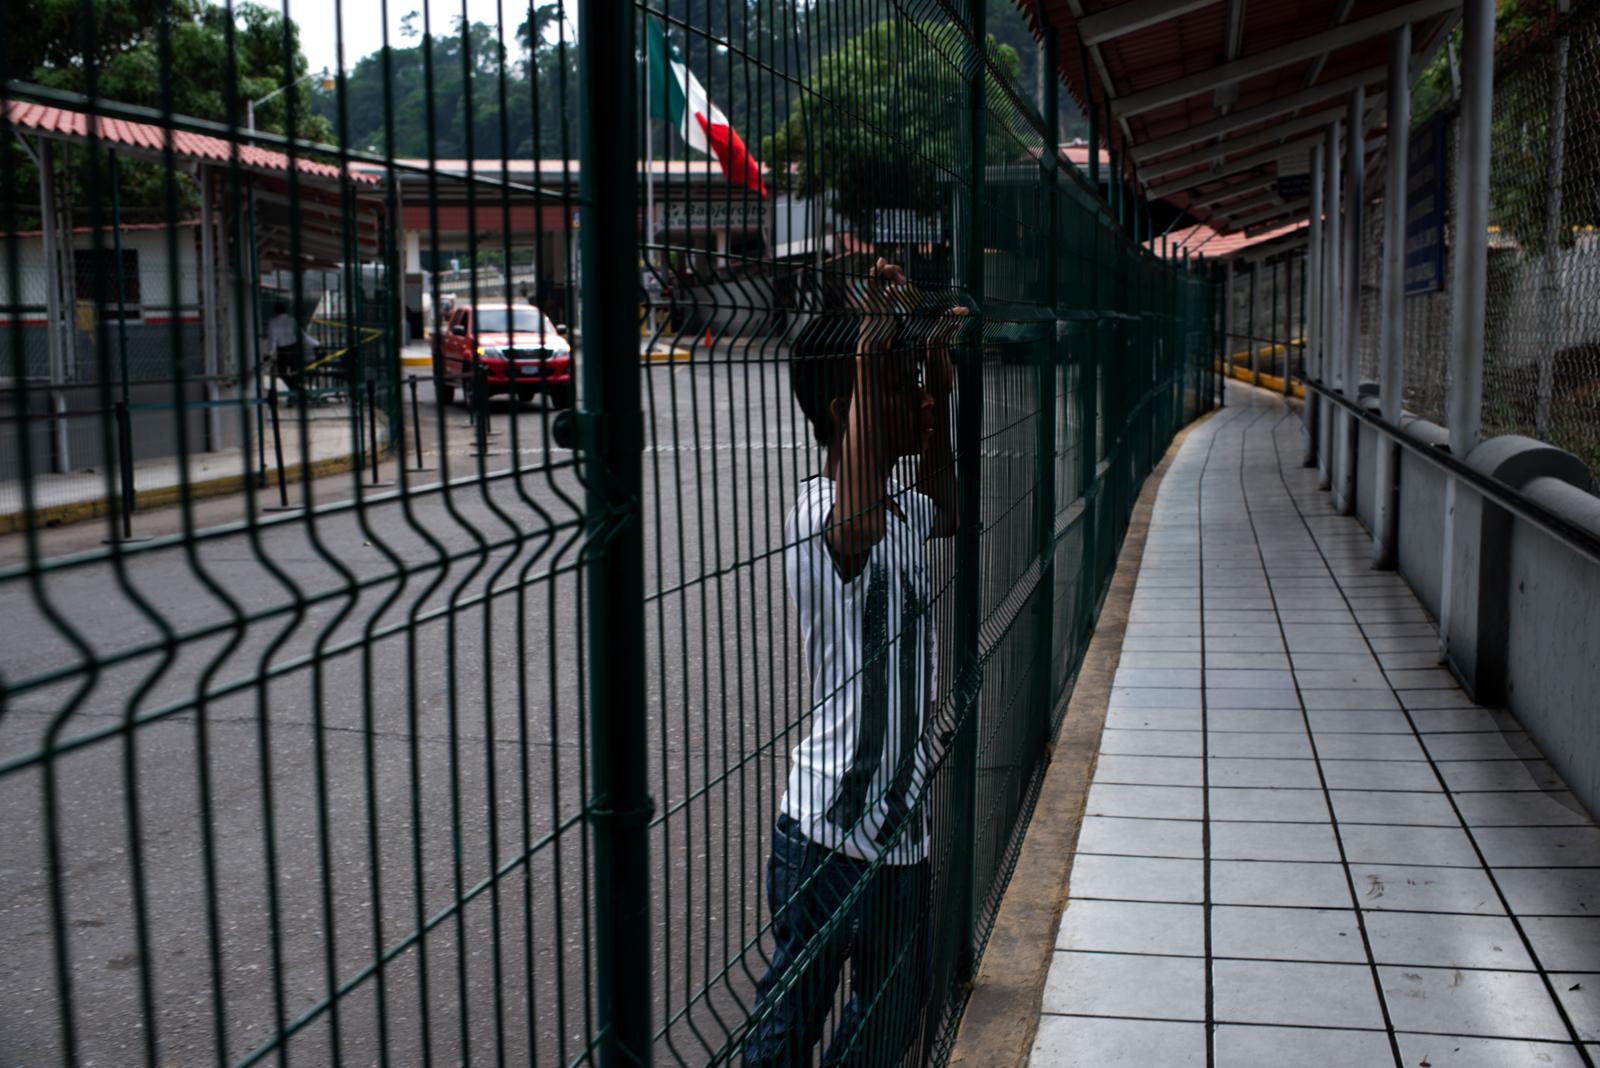 Central America turns its back on hundreds of thousands fleeing 'war-like' violence